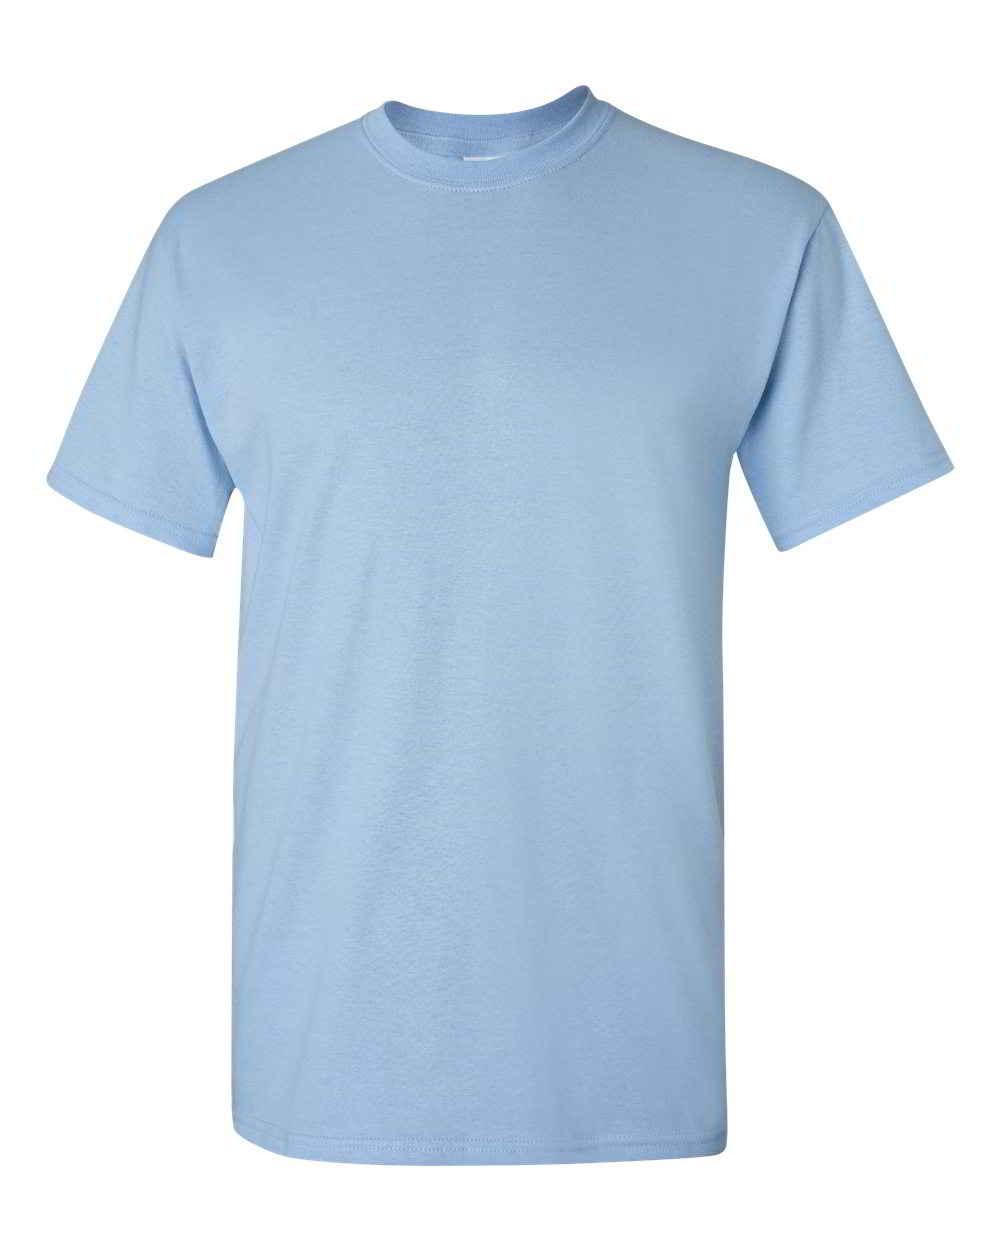 Gildan-Heavy-Cotton-Short-Sleeve-Mens-Blue-T-Shirts-5000 thumbnail 18